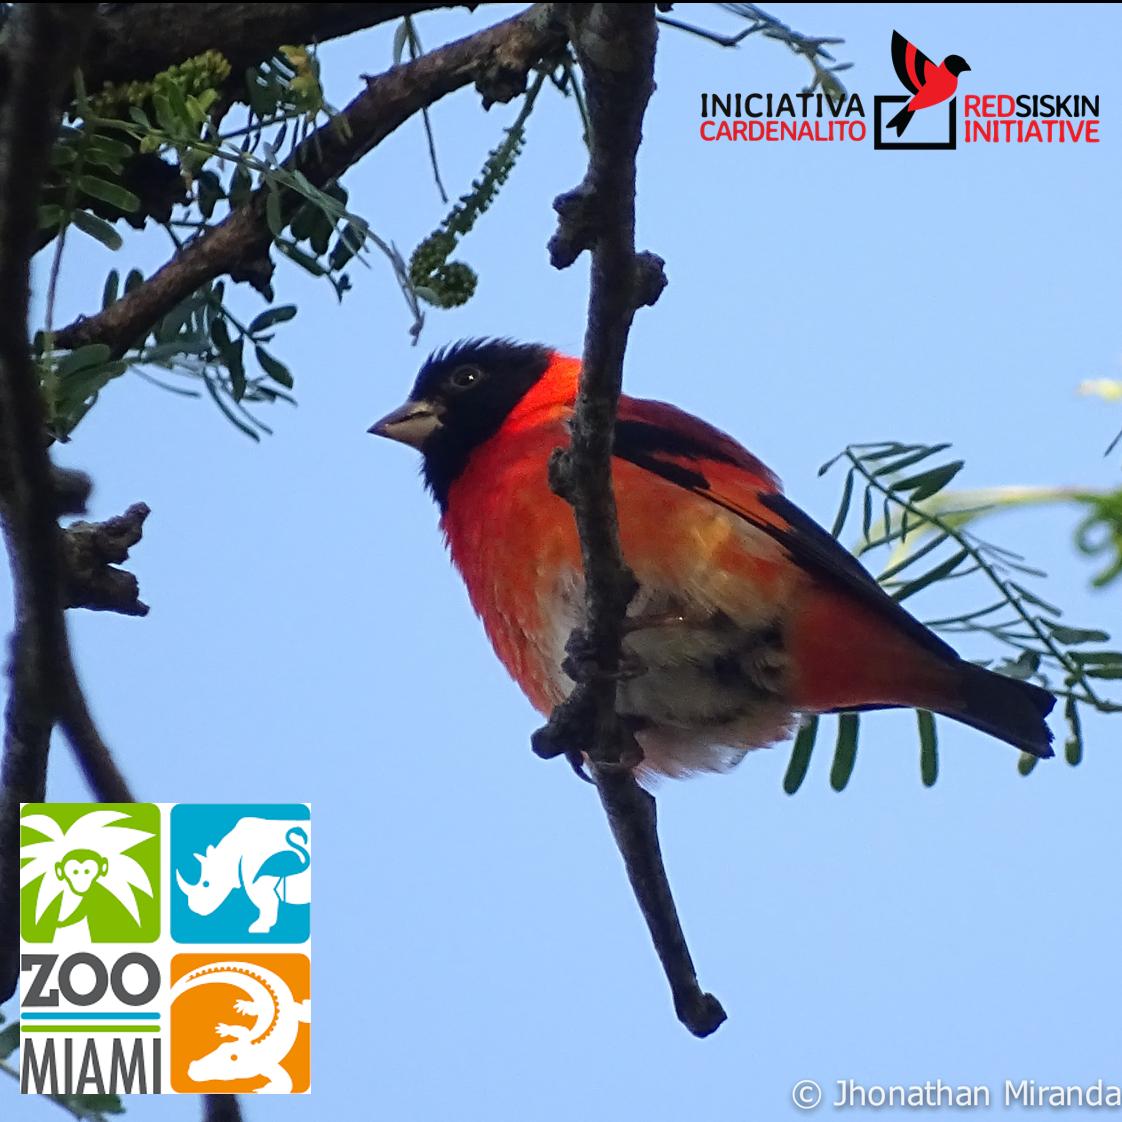 Bienvenido Zoo Miami a la familia de Iniciativa Cardenalito